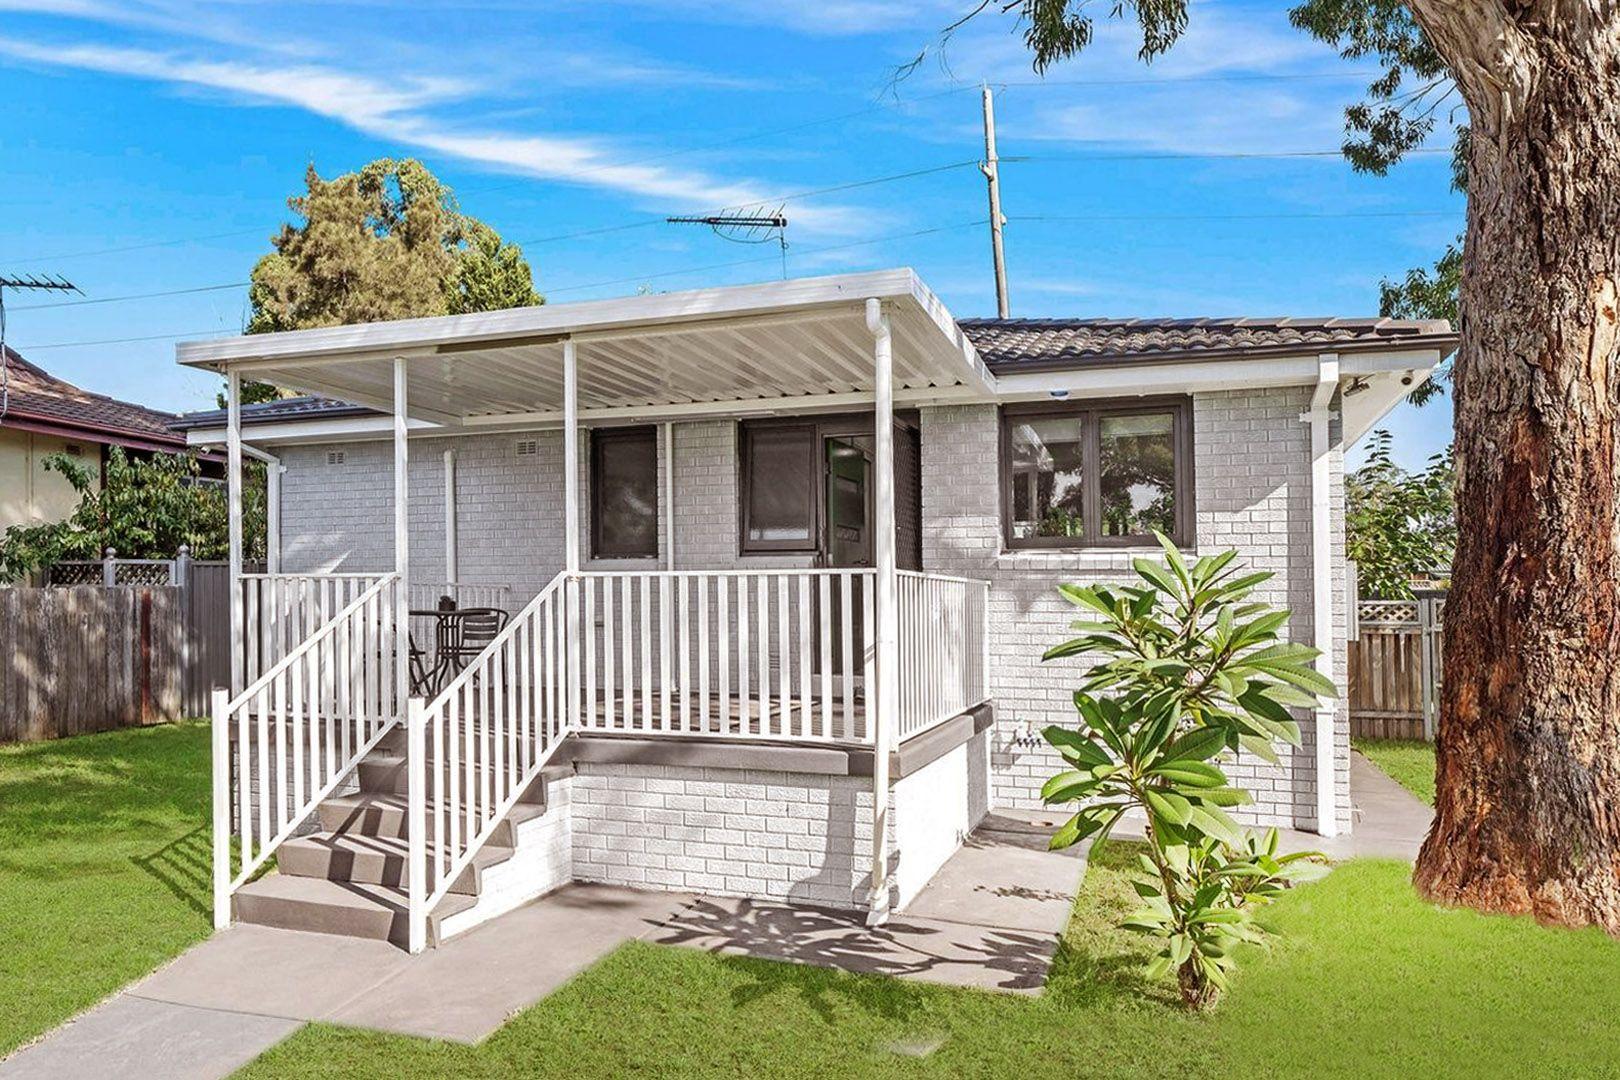 13 Marlock Place, Macquarie Fields NSW 2564, Image 0